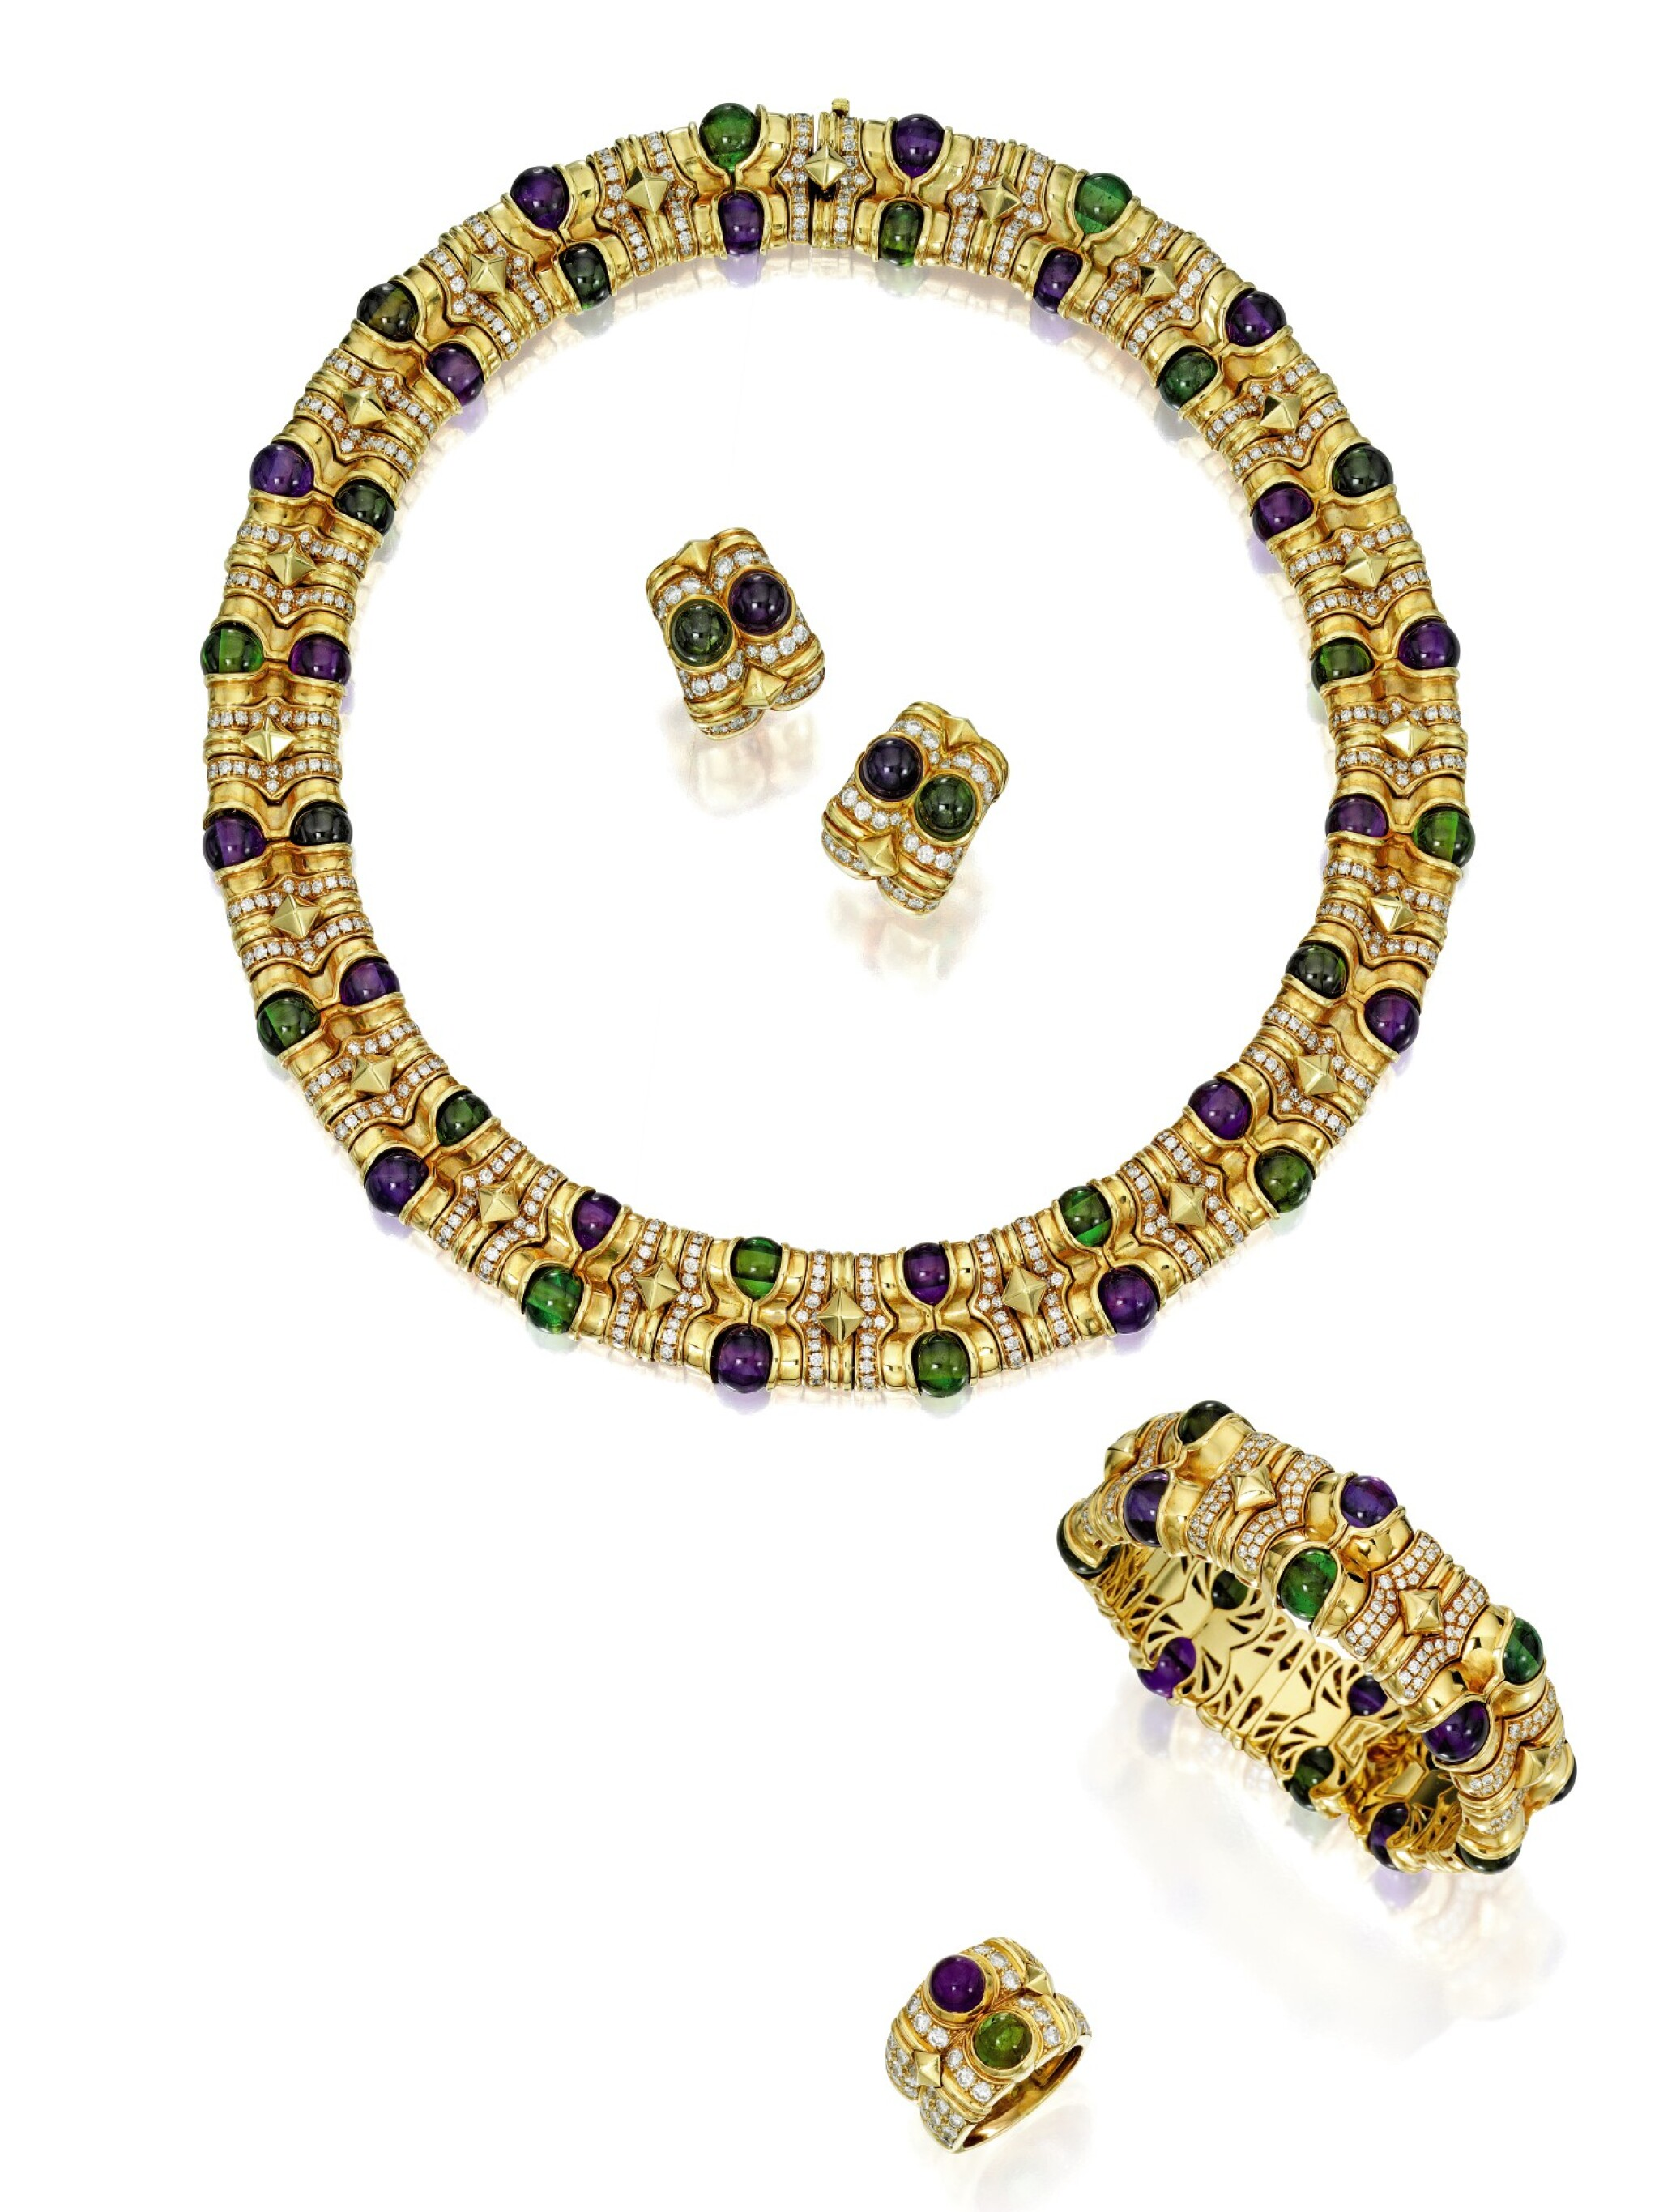 View full screen - View 1 of Lot 584. SUITE OF GOLD, AMETHYST, TOURMALINE AND DIAMOND JEWELS, BULGARI | 黃金鑲紫水晶配璧璽及鑽石首飾套裝,寶格麗.